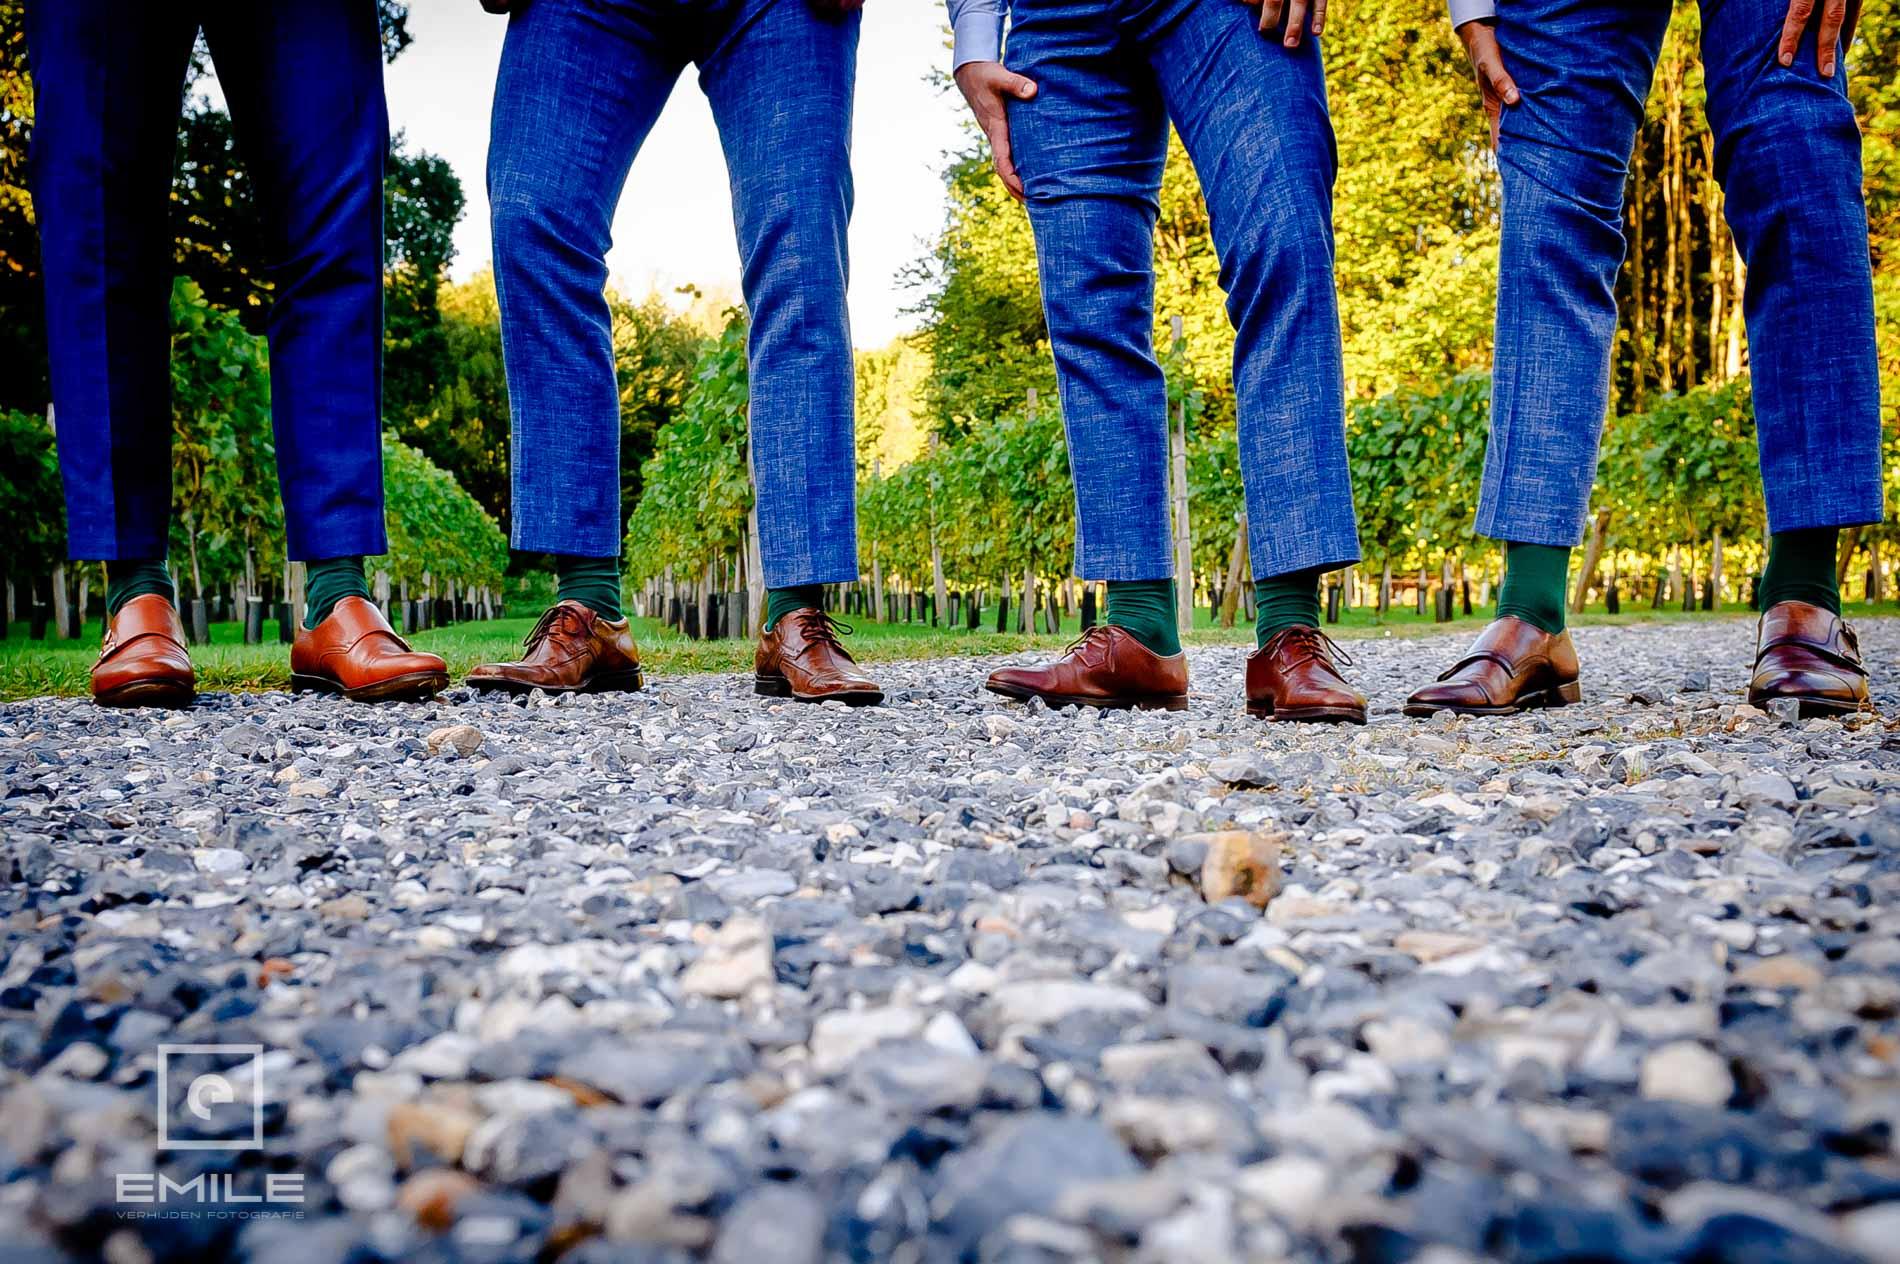 Bruidsfotograaf Landgraaf Winselerhof. De mannen laten hun schoenen zien